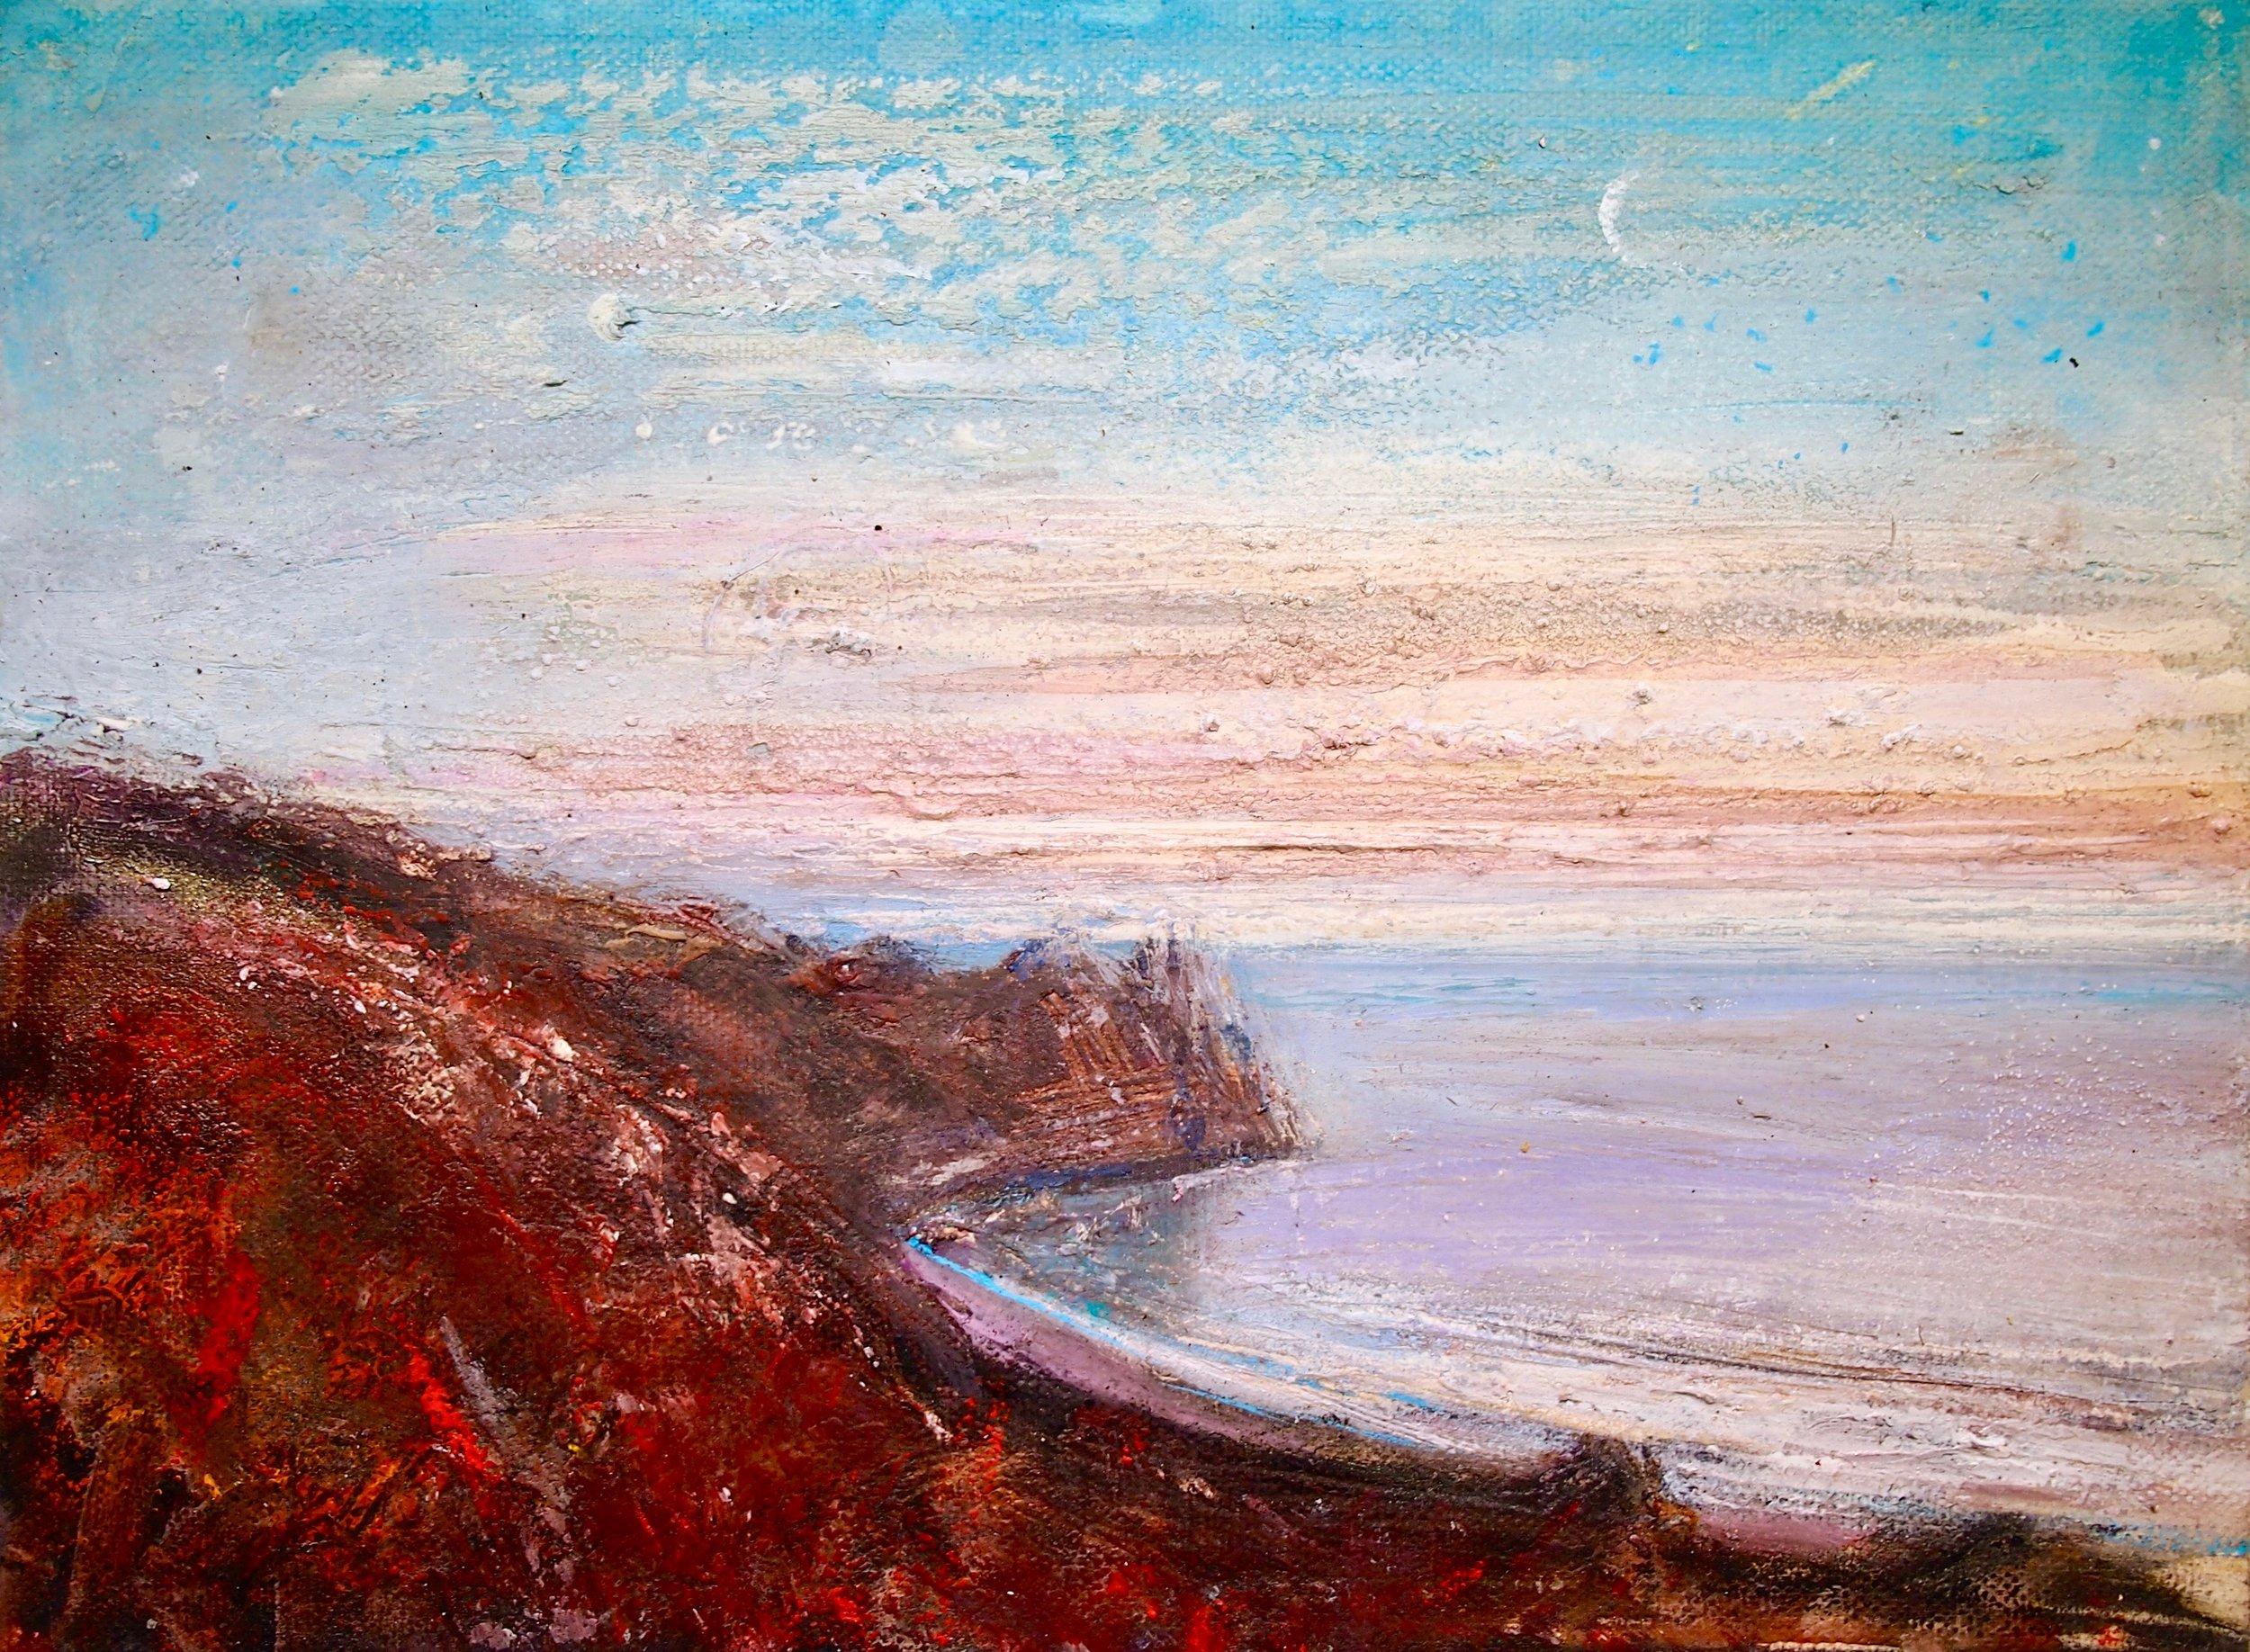 Tor Bay, Pembrokeshire - 30 x 25 cm